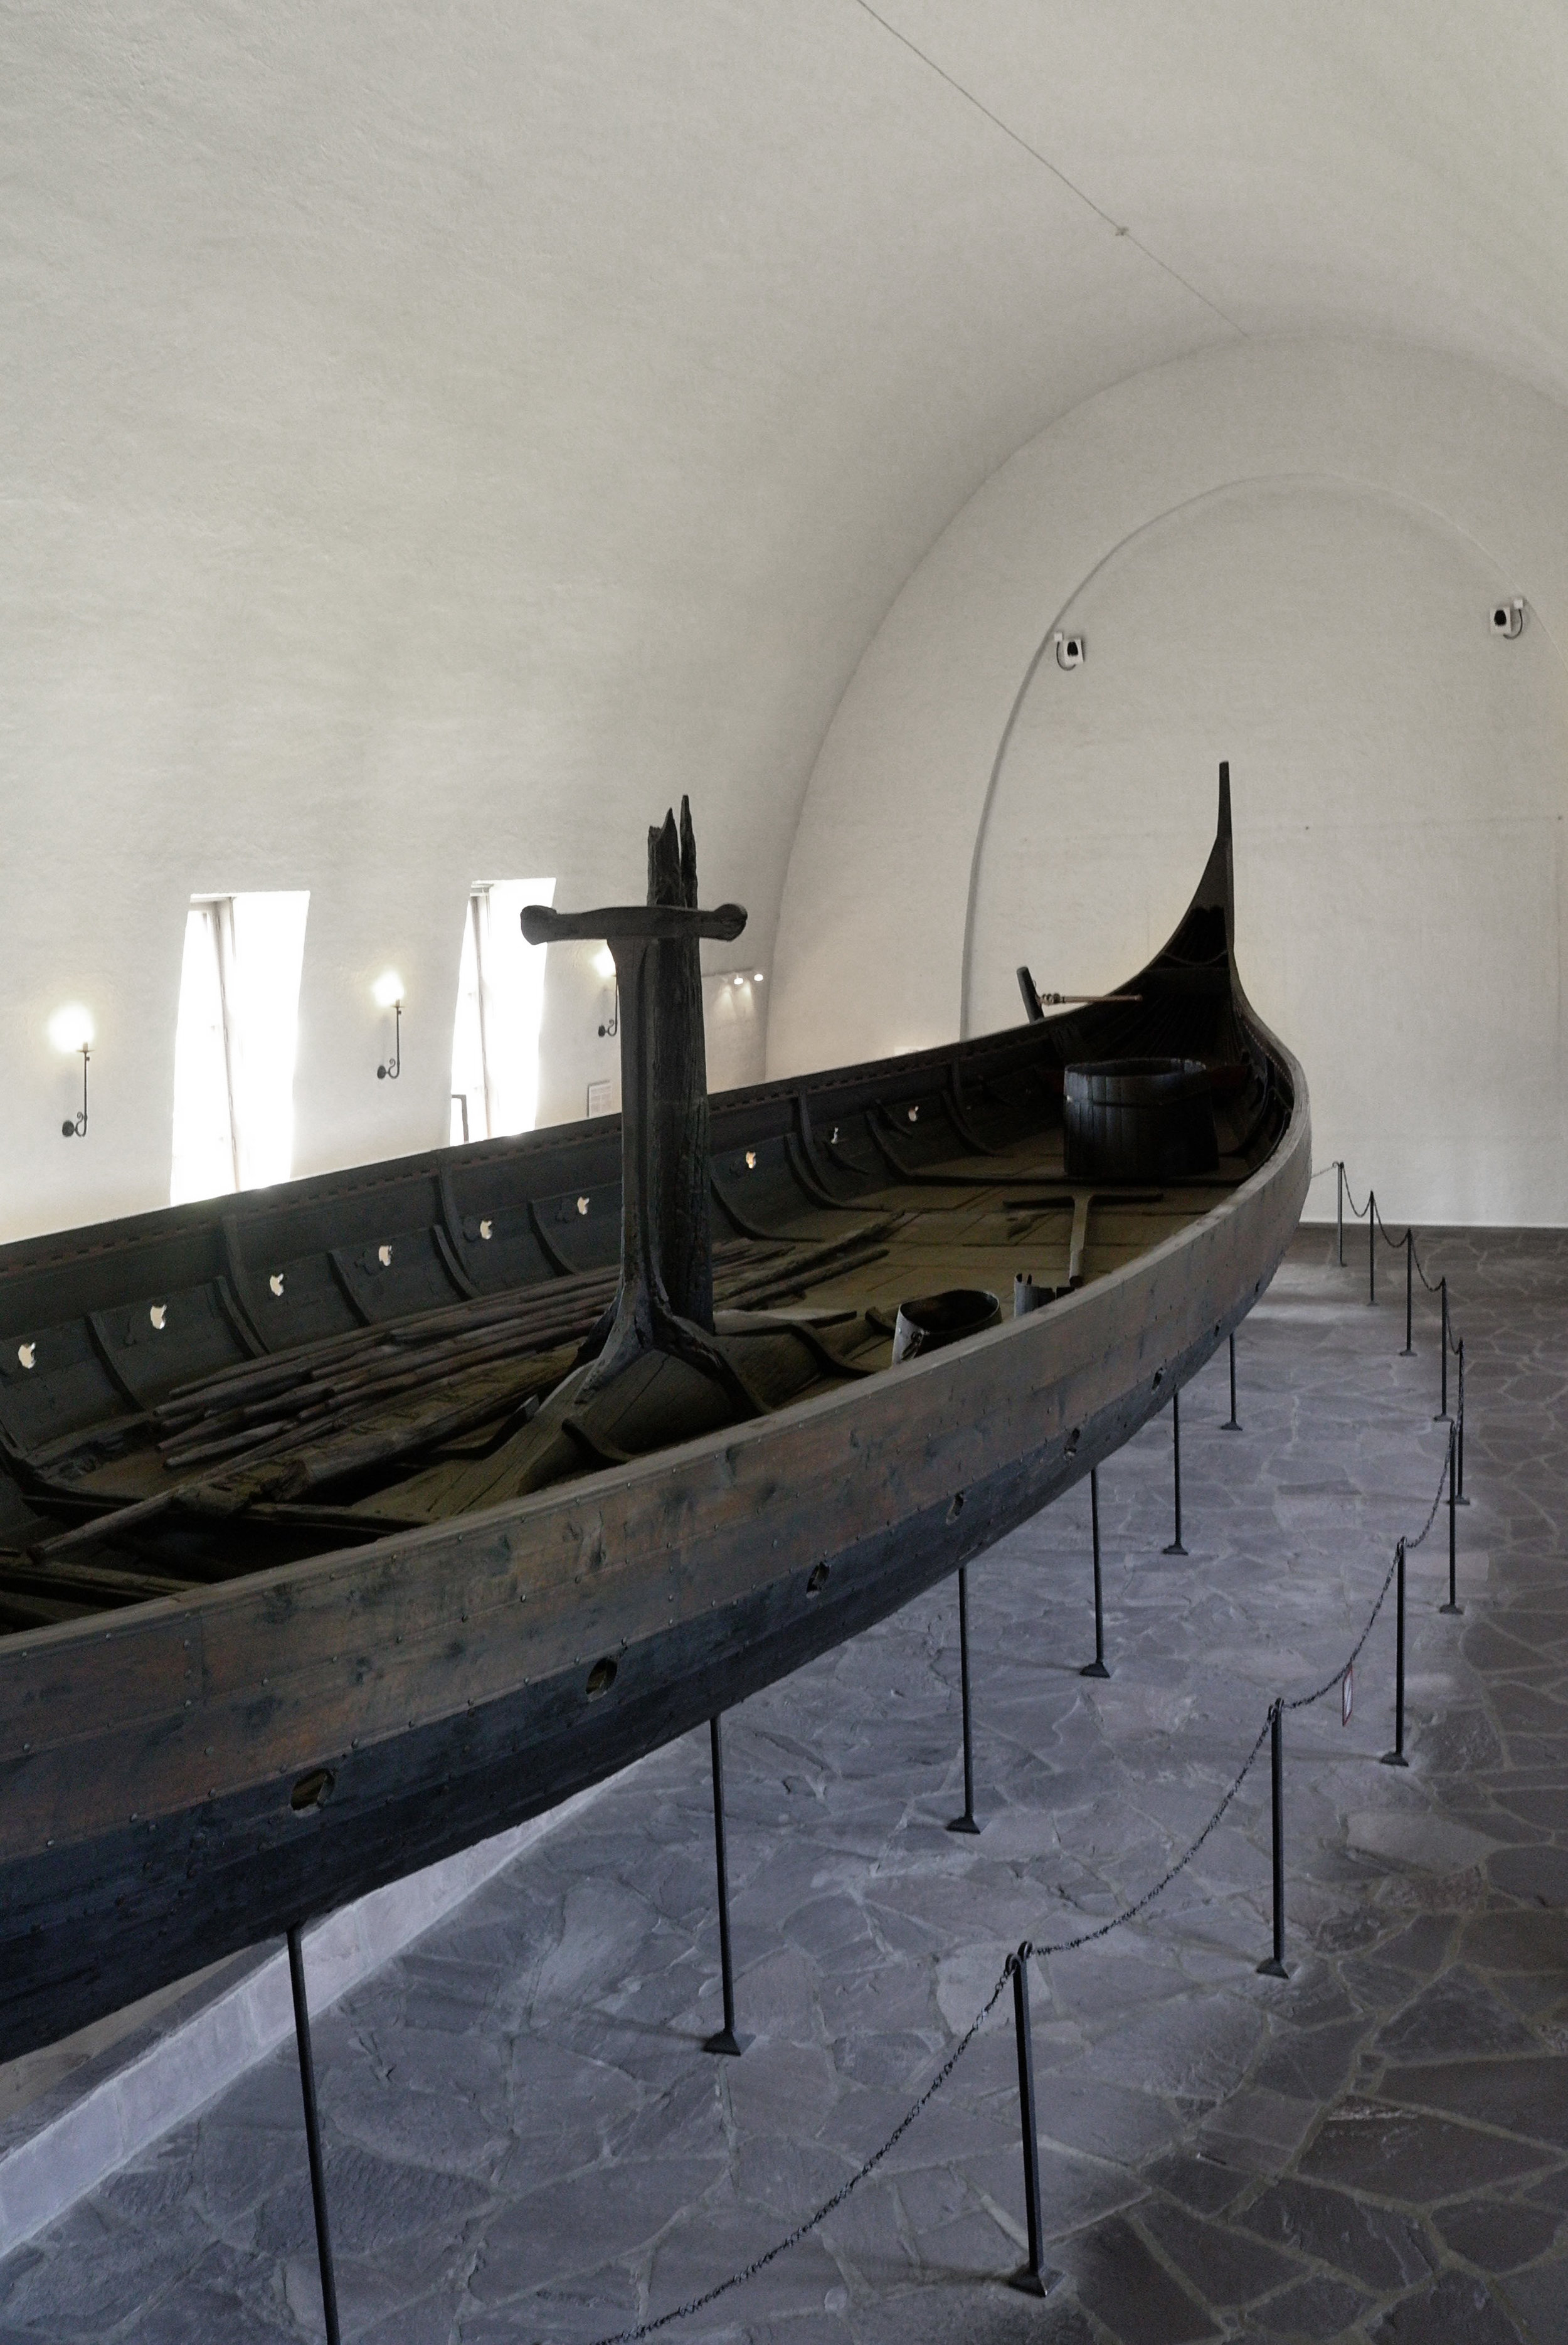 Lozidaze_Oslo-Viking-Ship_02